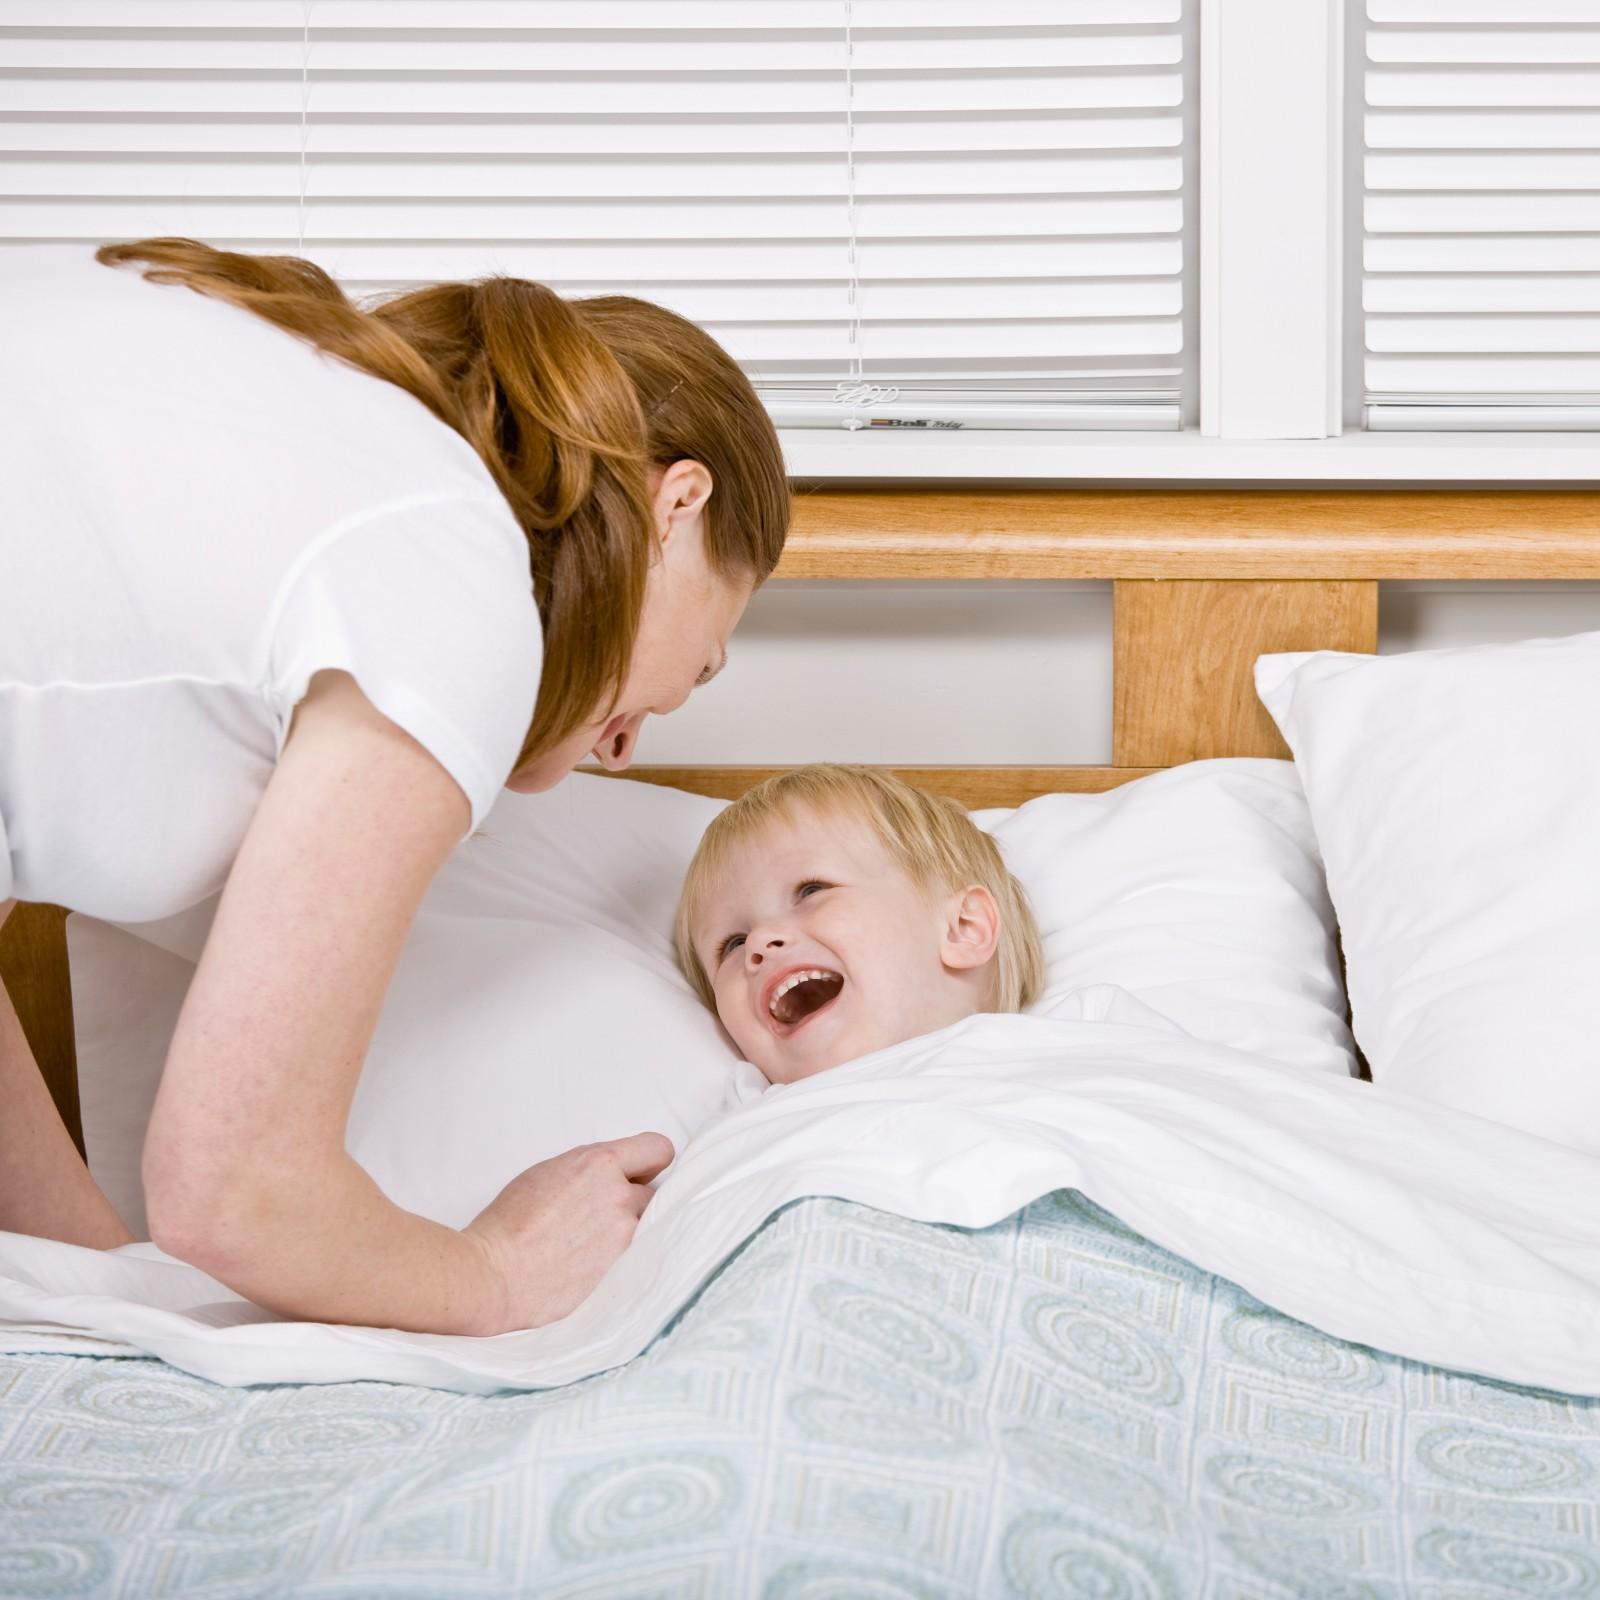 rutina diaria para una madre soltera